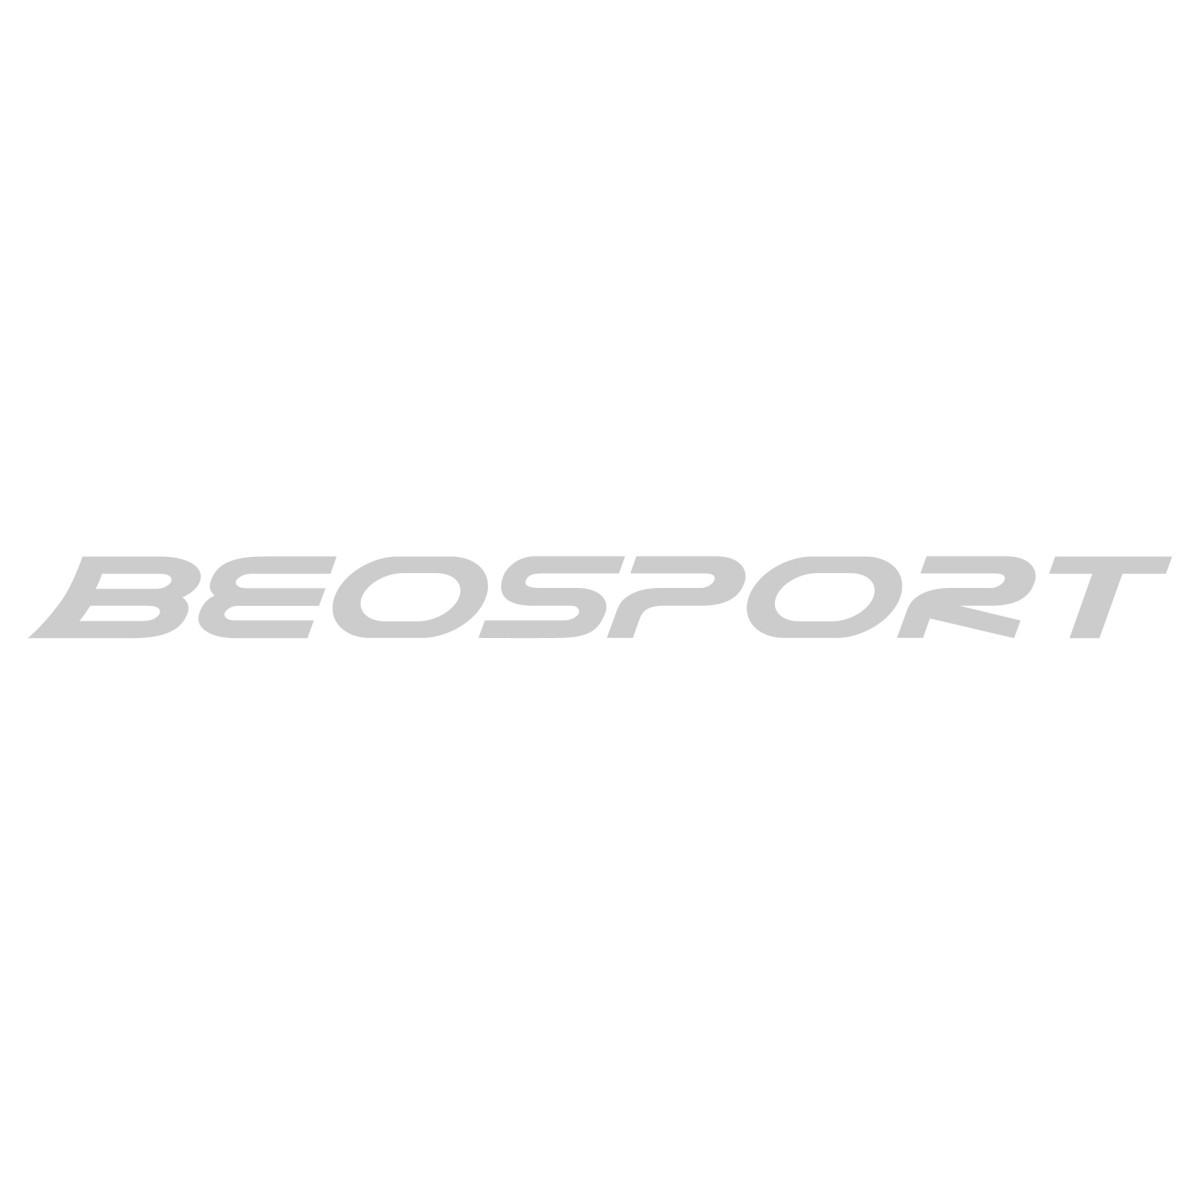 The North Face - Eu duks